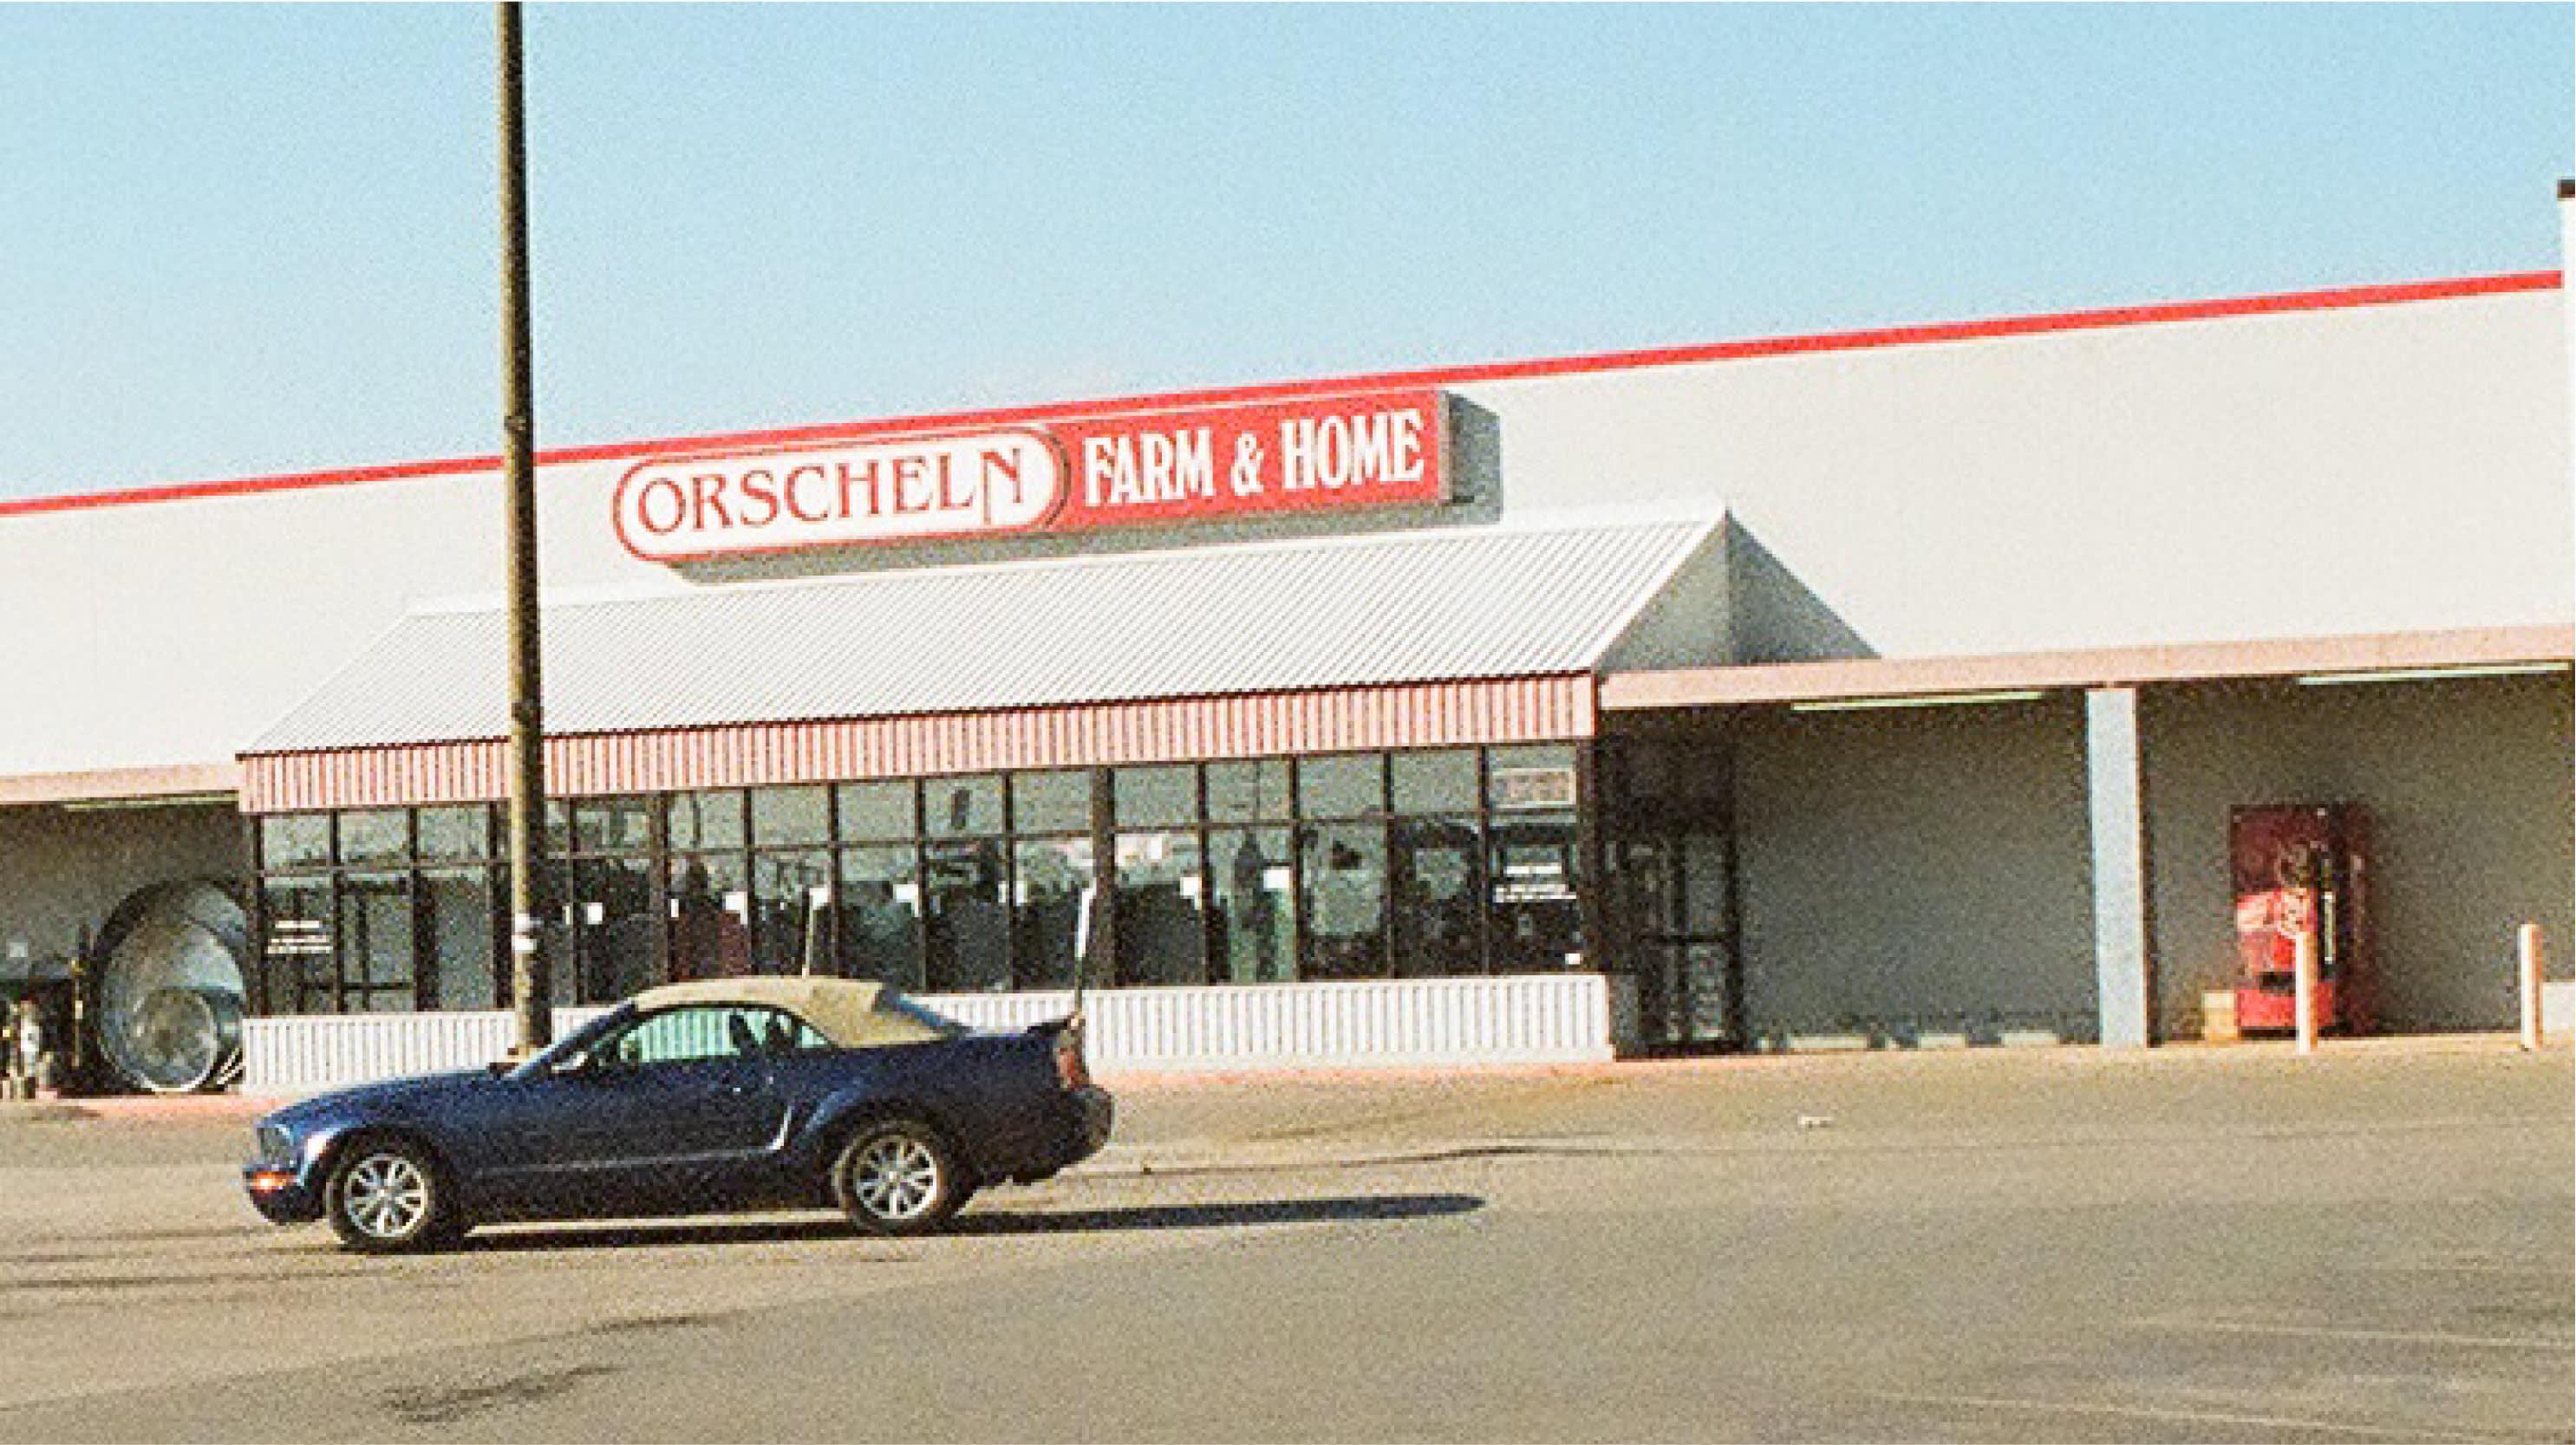 Front view of Orscheln Farm & Home Store in Arkansas City, Kansas 67005-8813